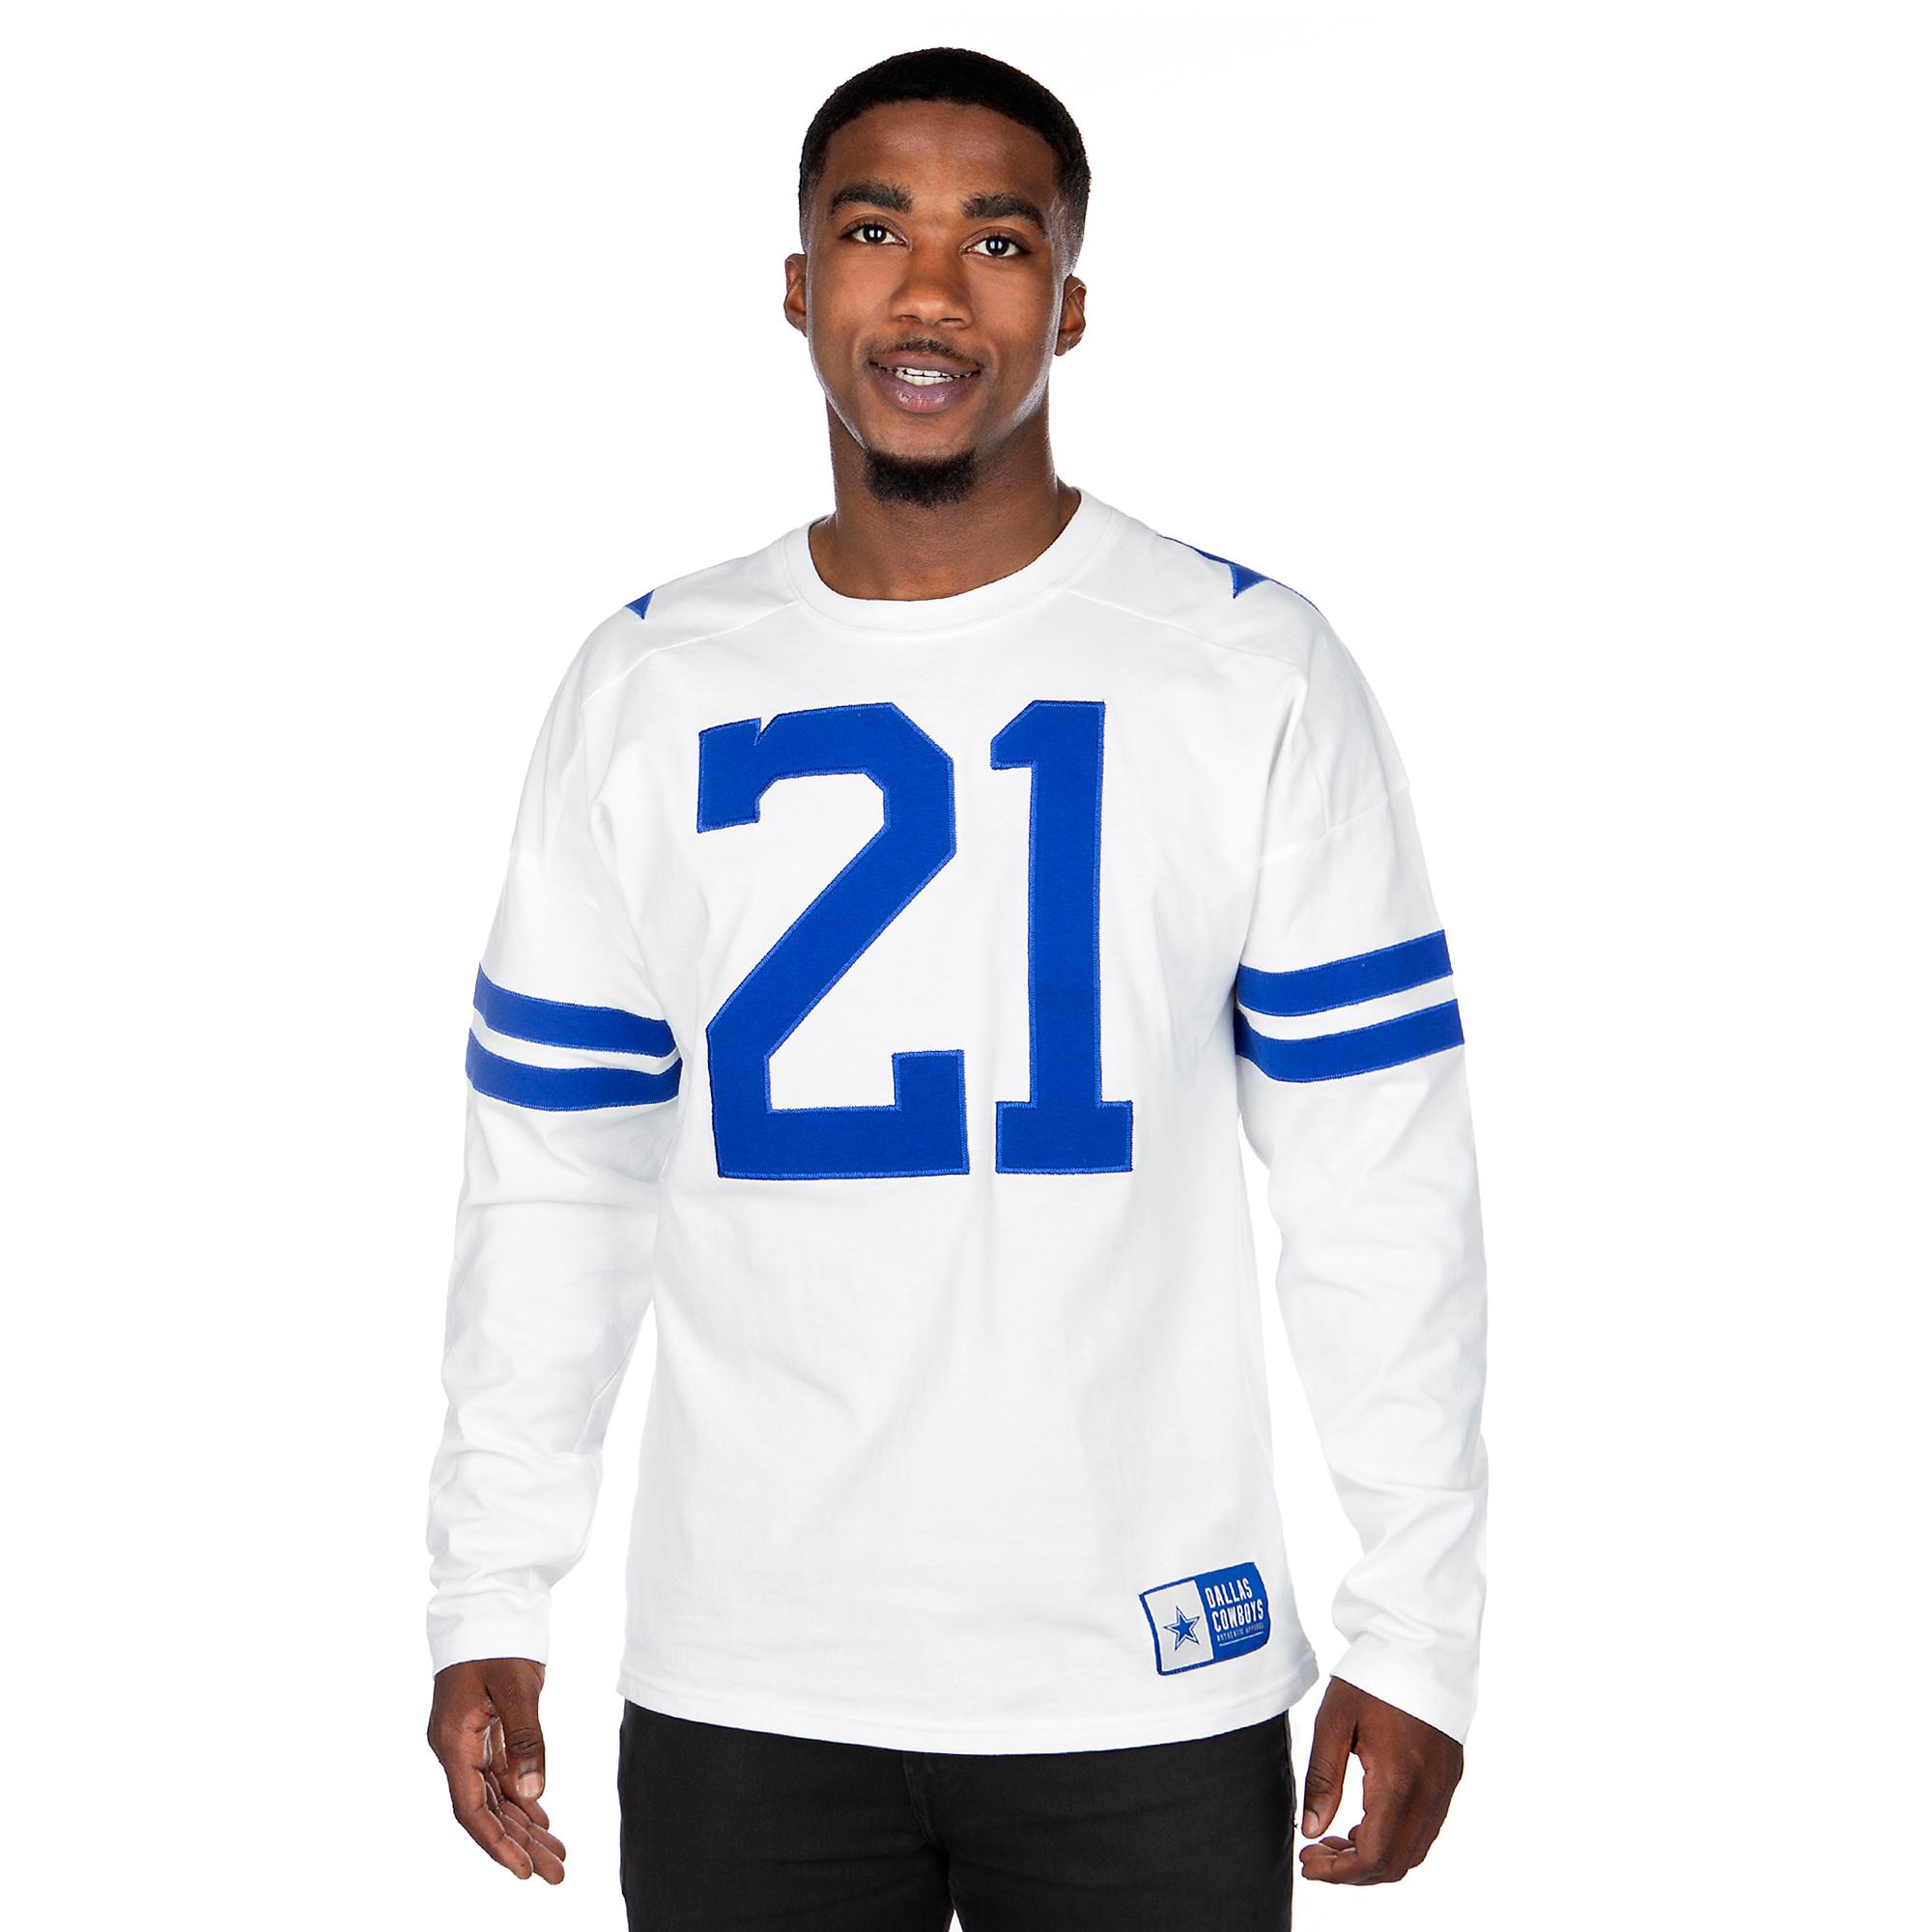 hot sale online 84bb8 70909 Dallas Cowboys Mens Legacy Ezekiel Elliott Jersey T-Shirt | Fans United